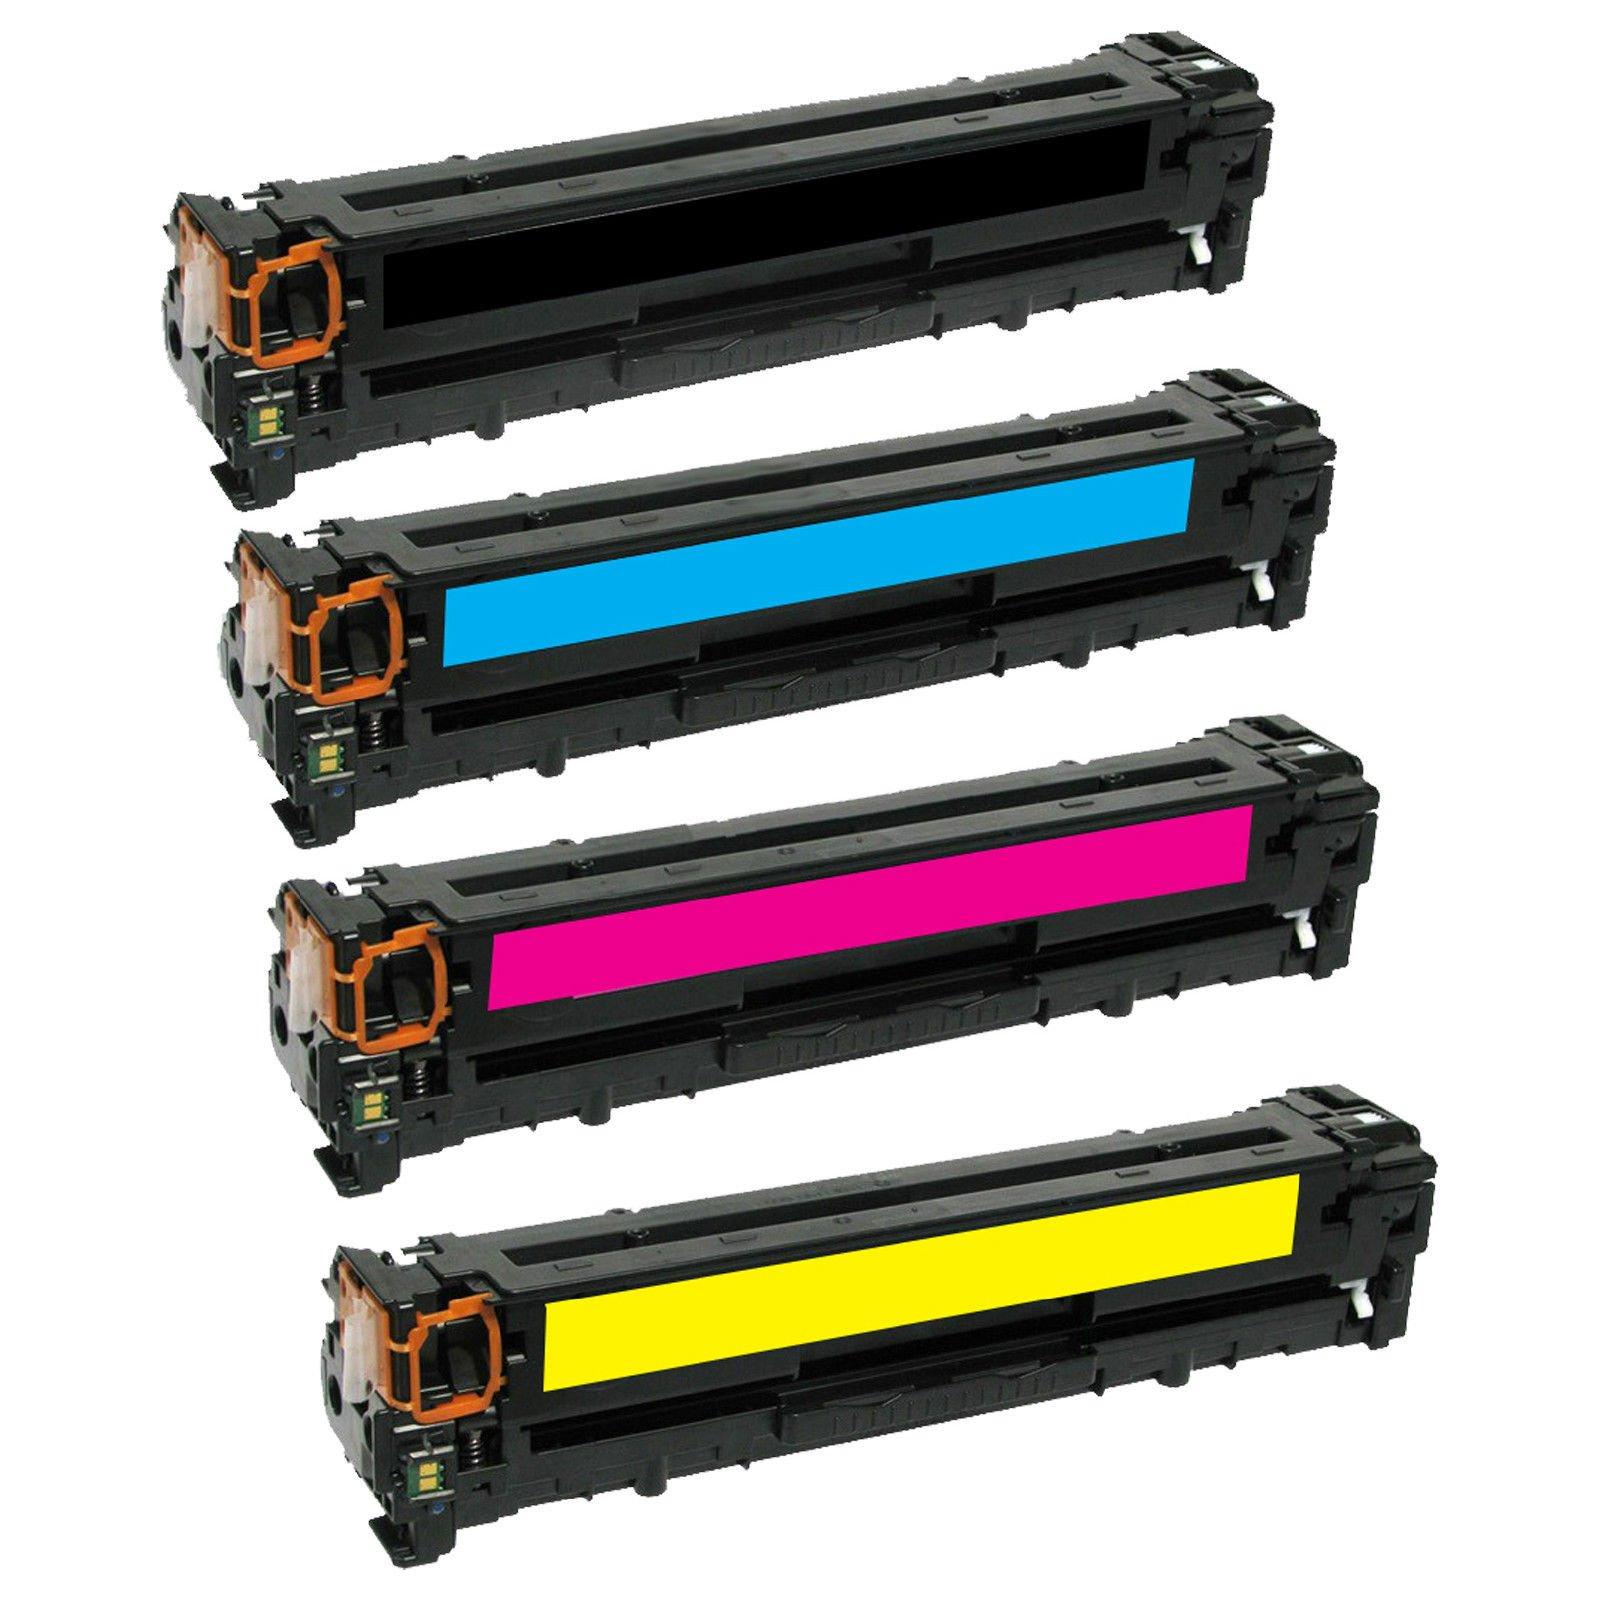 HQ Supplies Compatible Replacements for HP 305A HP CE410A CE411A CE412A CE413A Toner Set (Black, Cyan, Yellow, Magenta) for use in HP MFP M375nw HP M451dw M451dn MFP M475dn MFP M475dw Printers